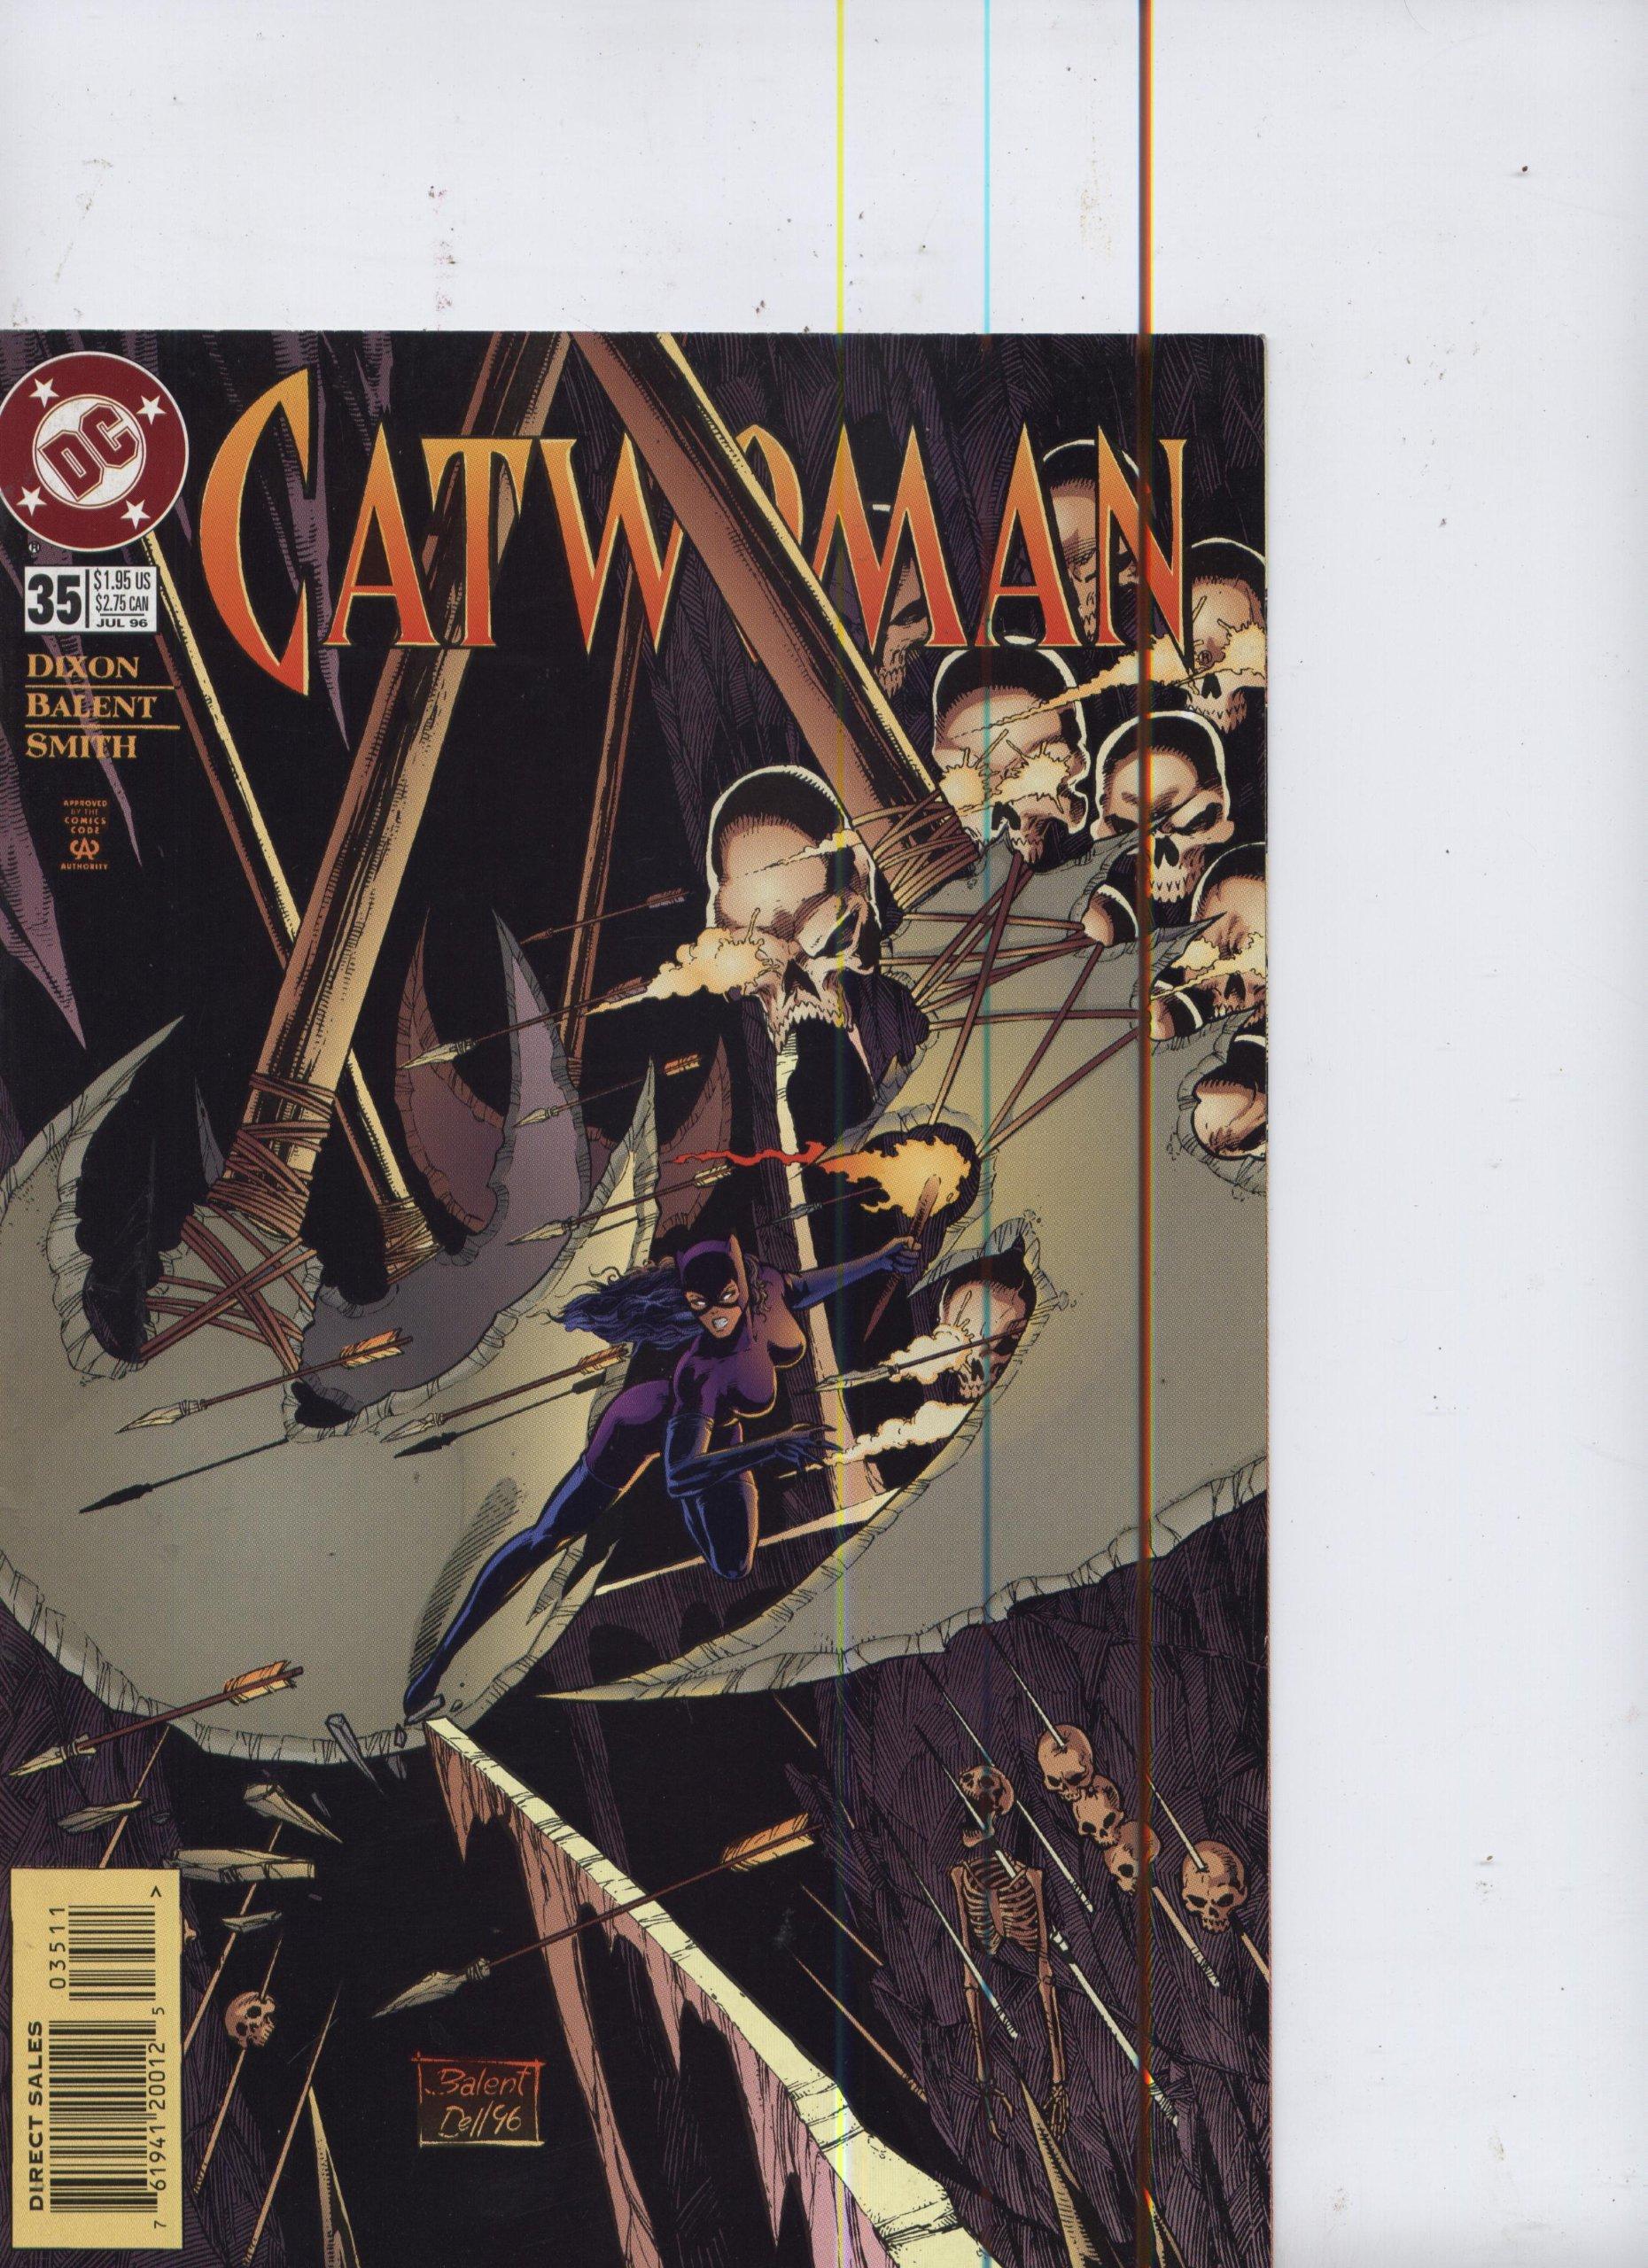 Catwoman #33 May 1996 DC Comics Dixon Balent Smith